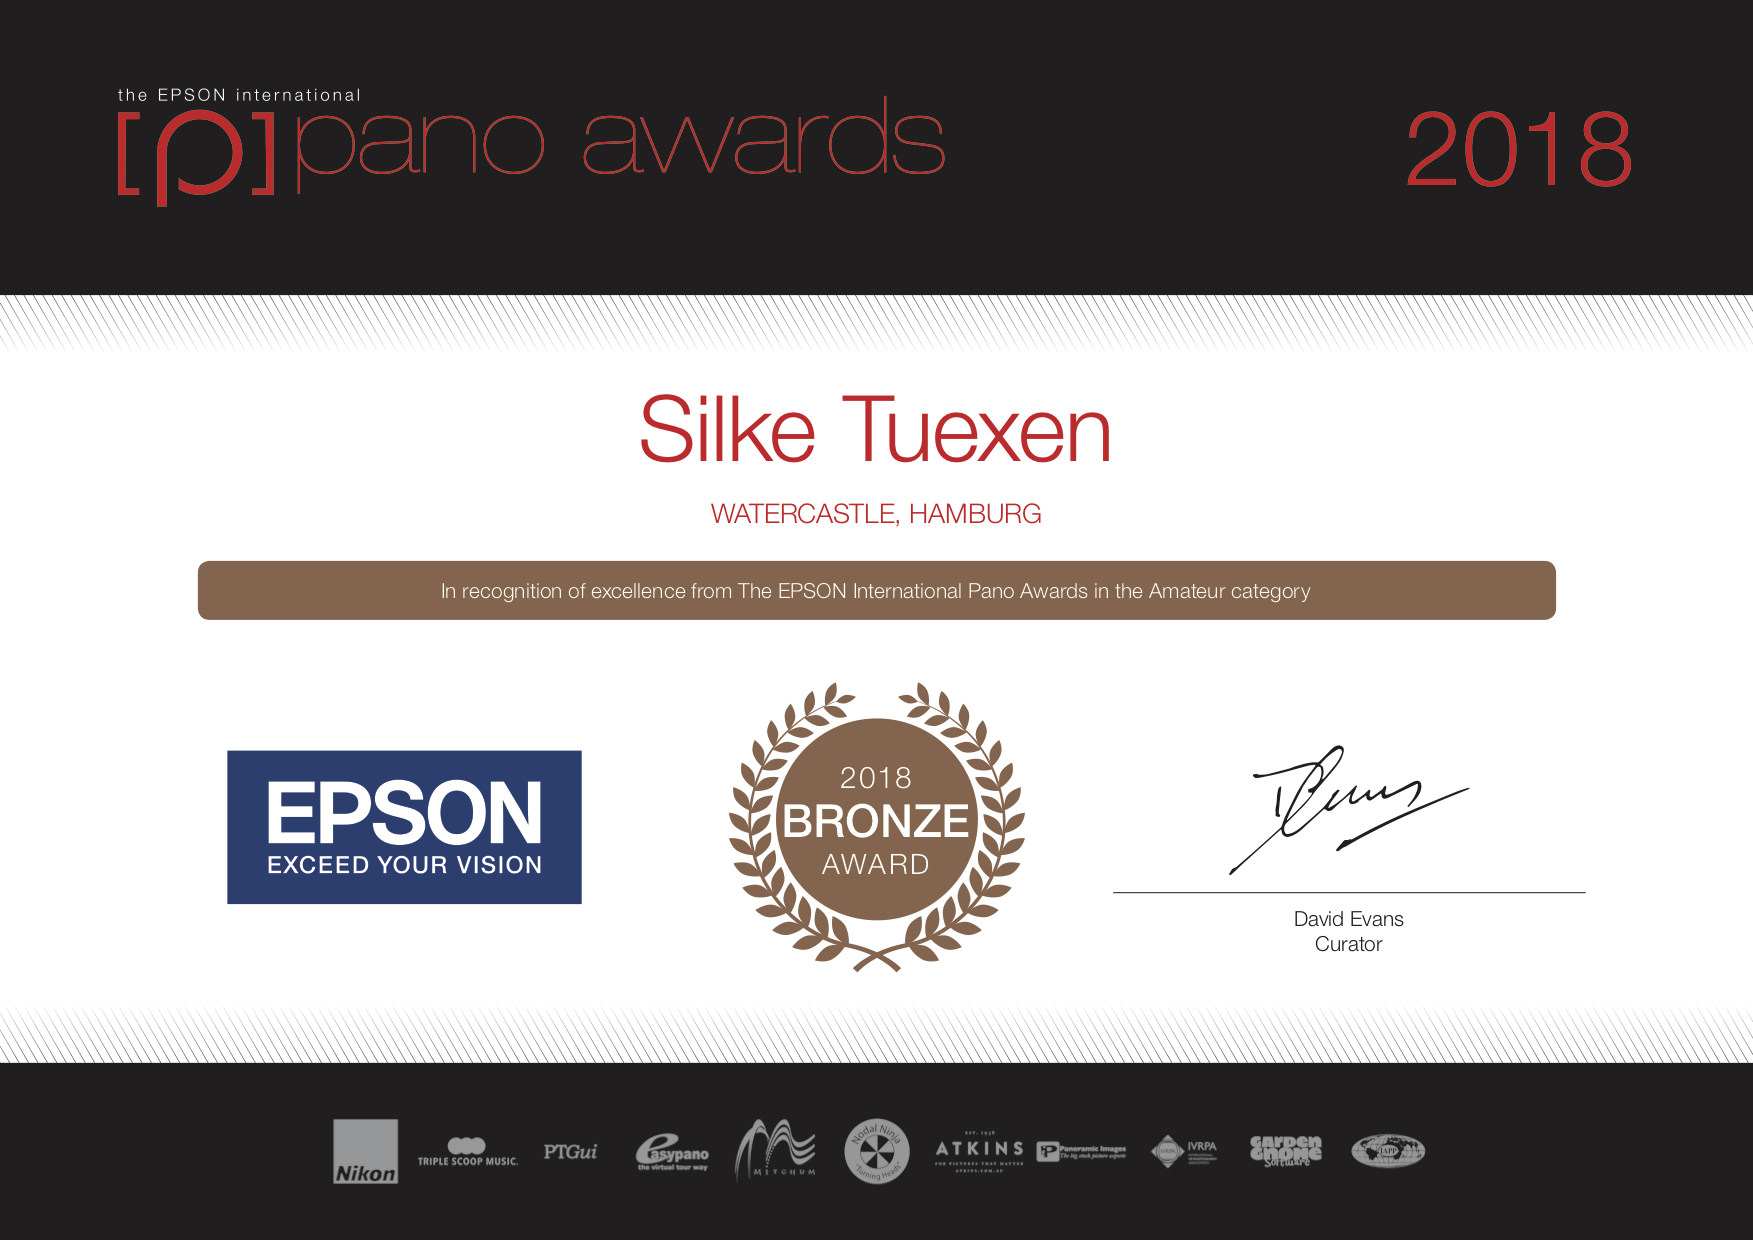 2018-Epson-Pano-Awards-Amateur-Bronze-284watercastle.jpg